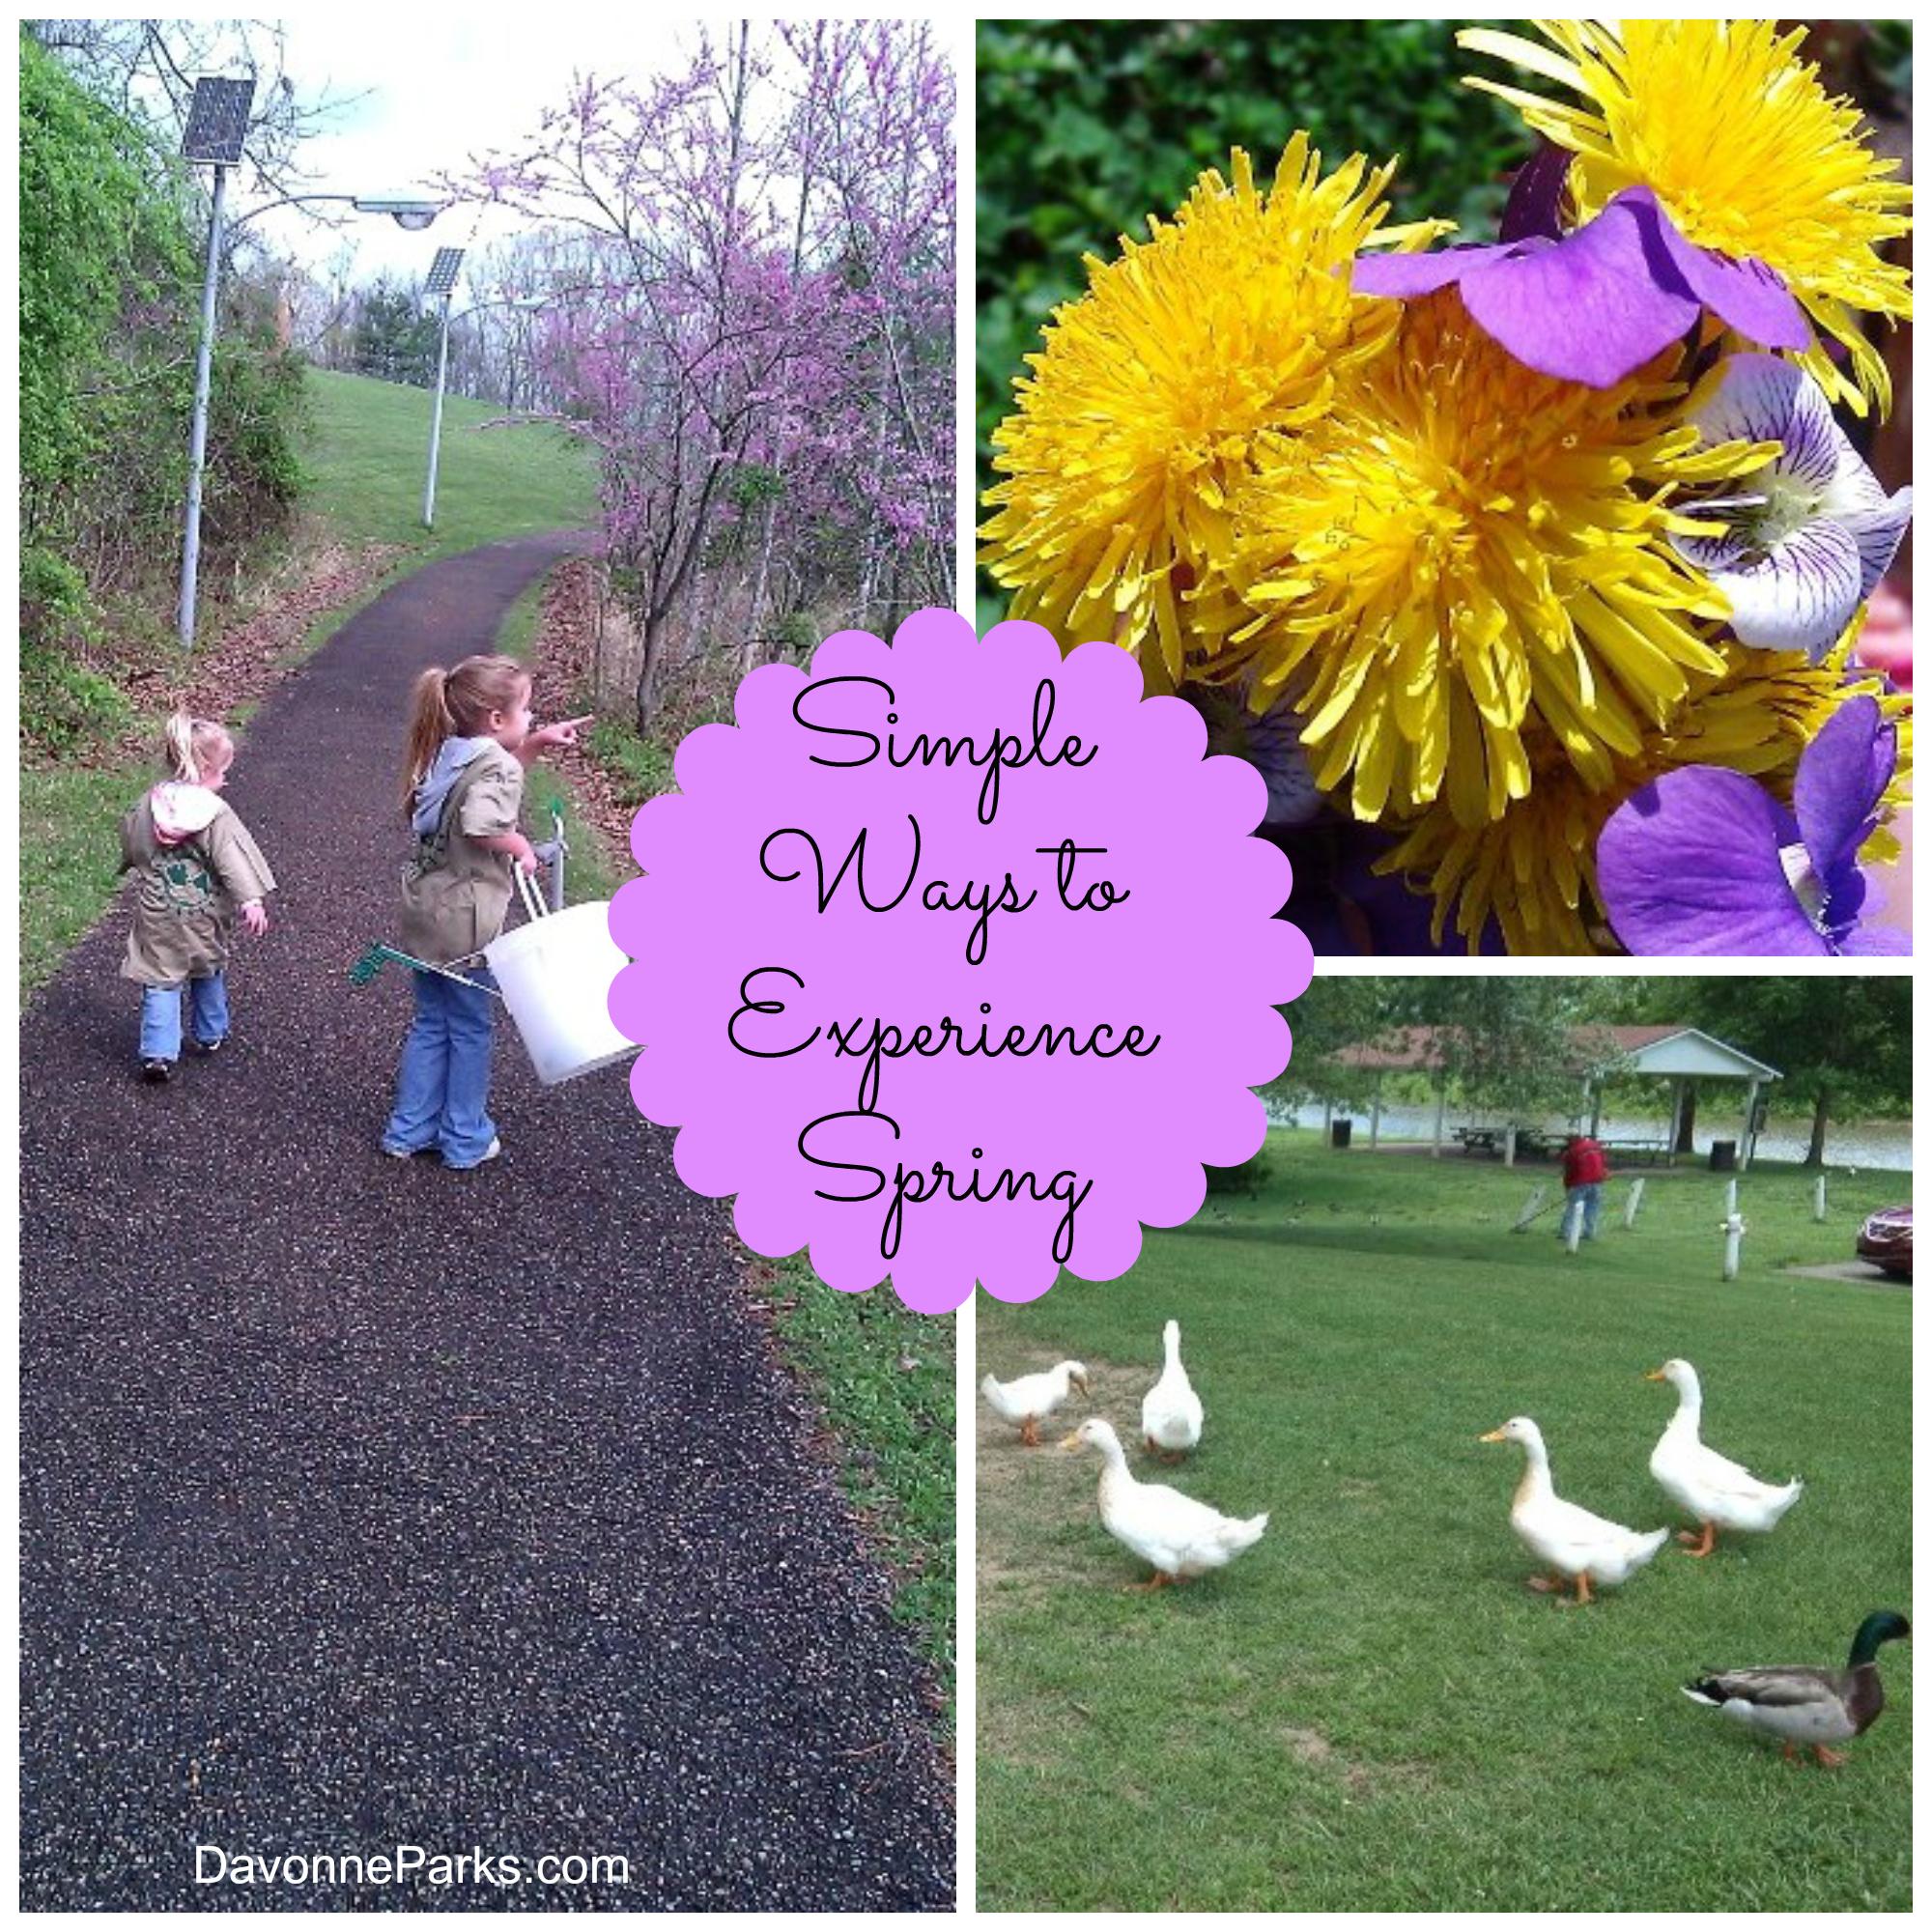 Simple Ways to Experience Spring